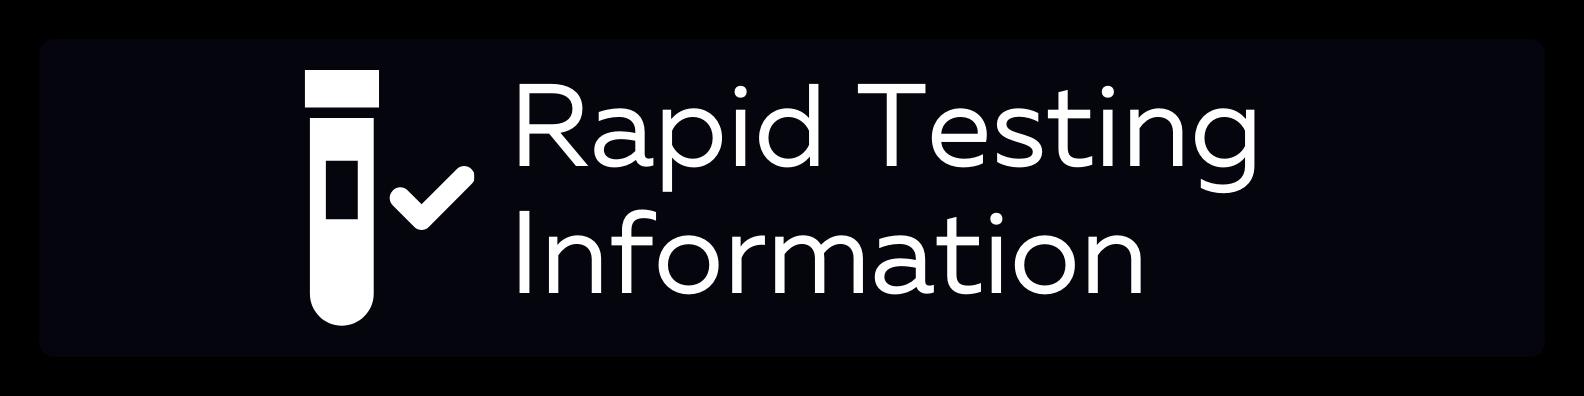 Rapid Testing Information